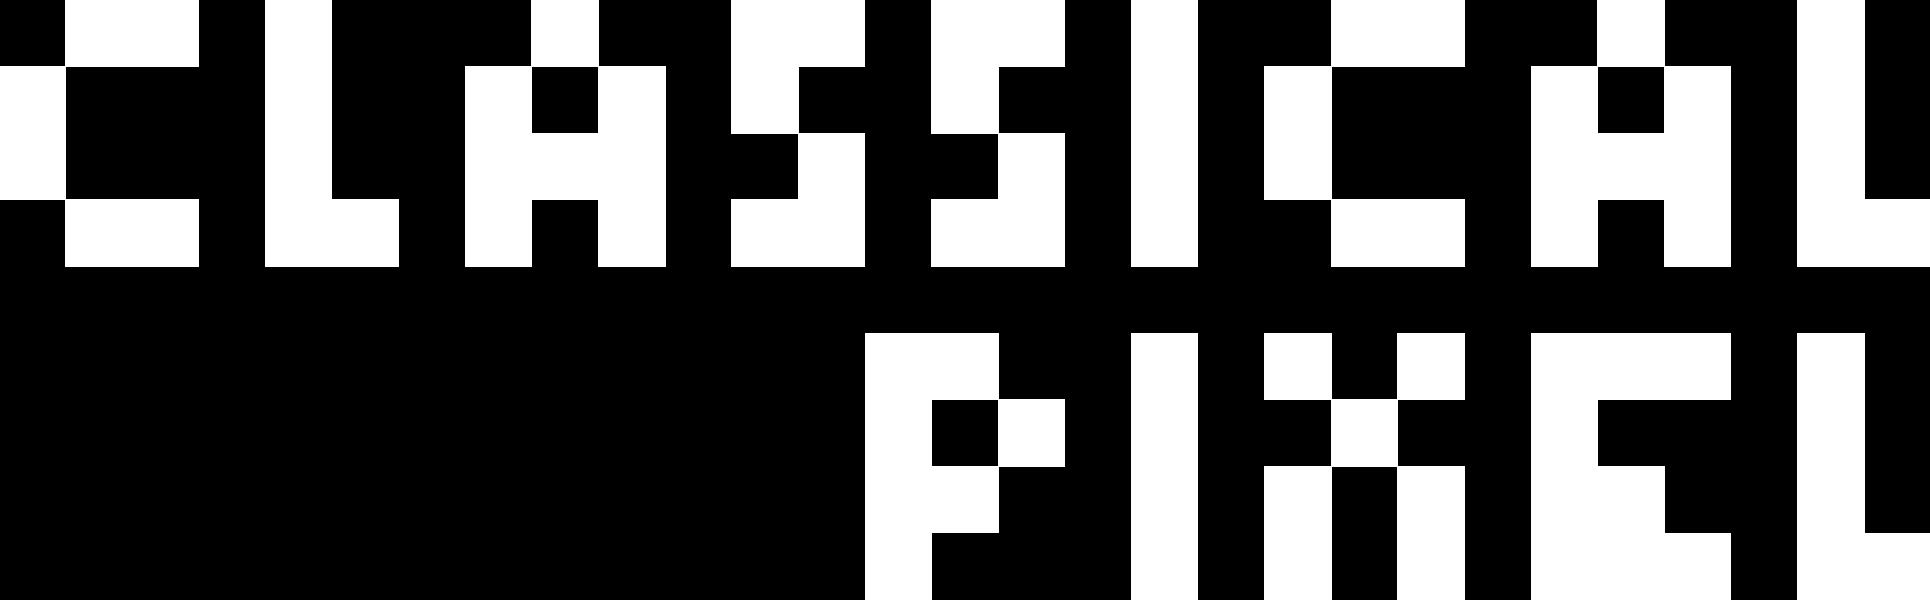 ClassicalPixel logo